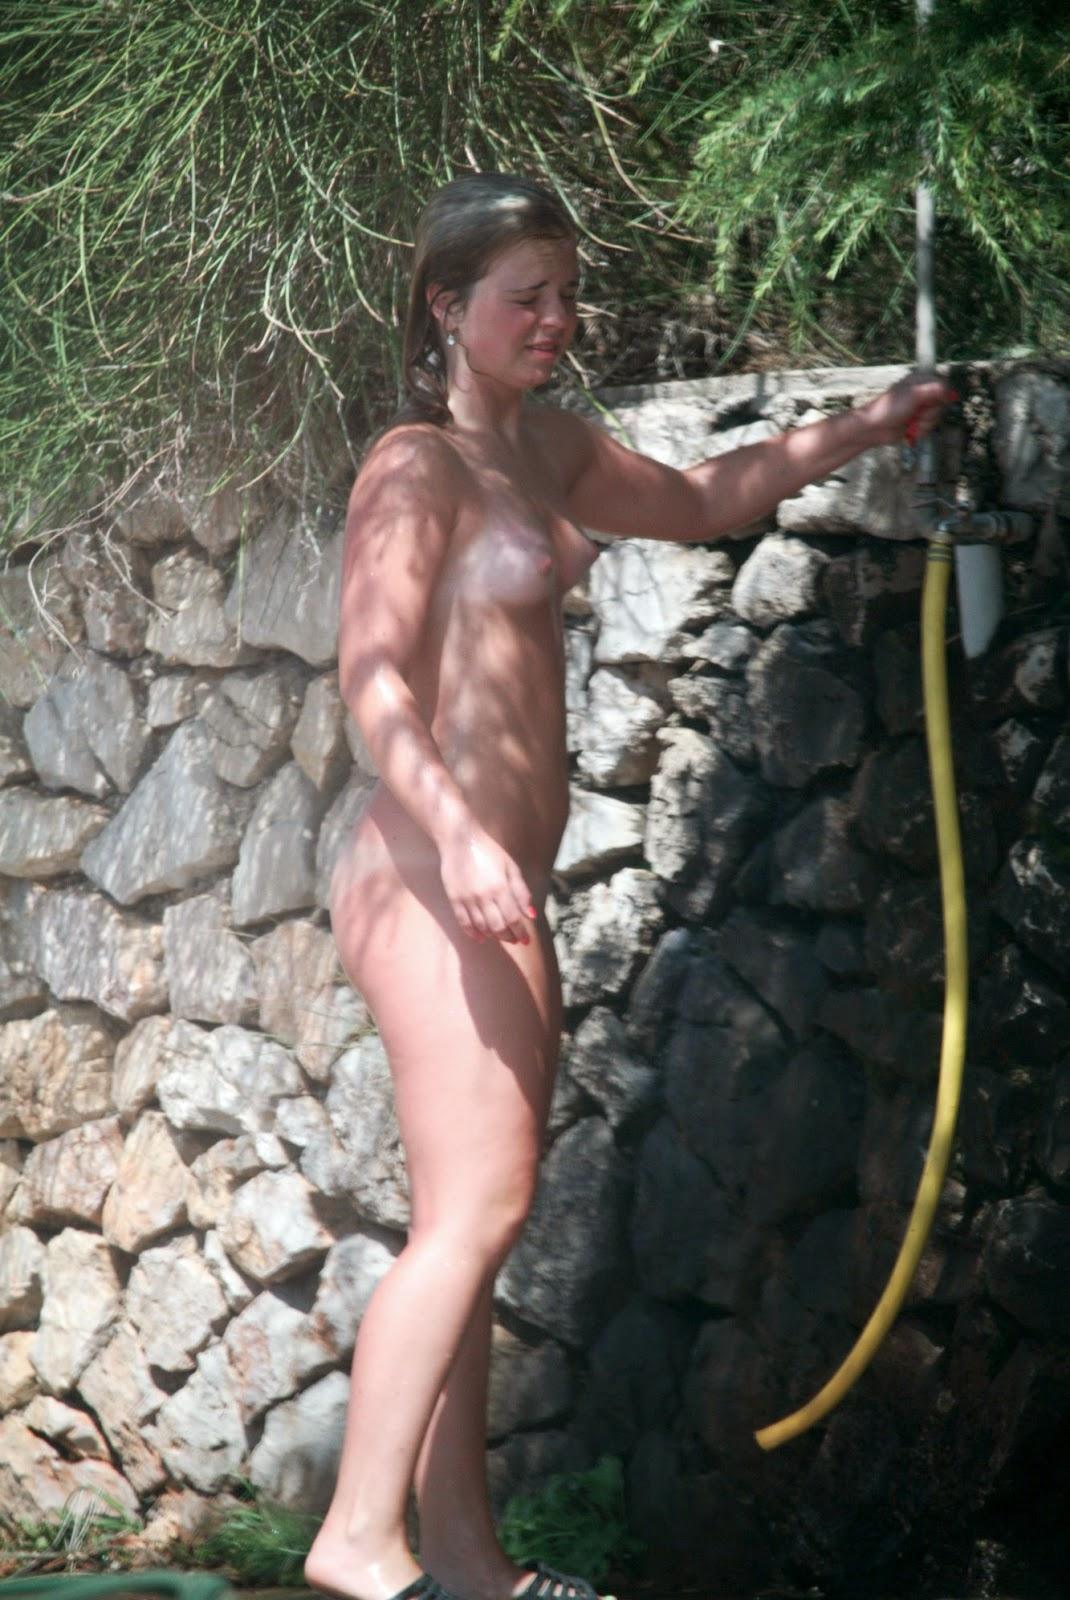 croatia girls naked in the shower